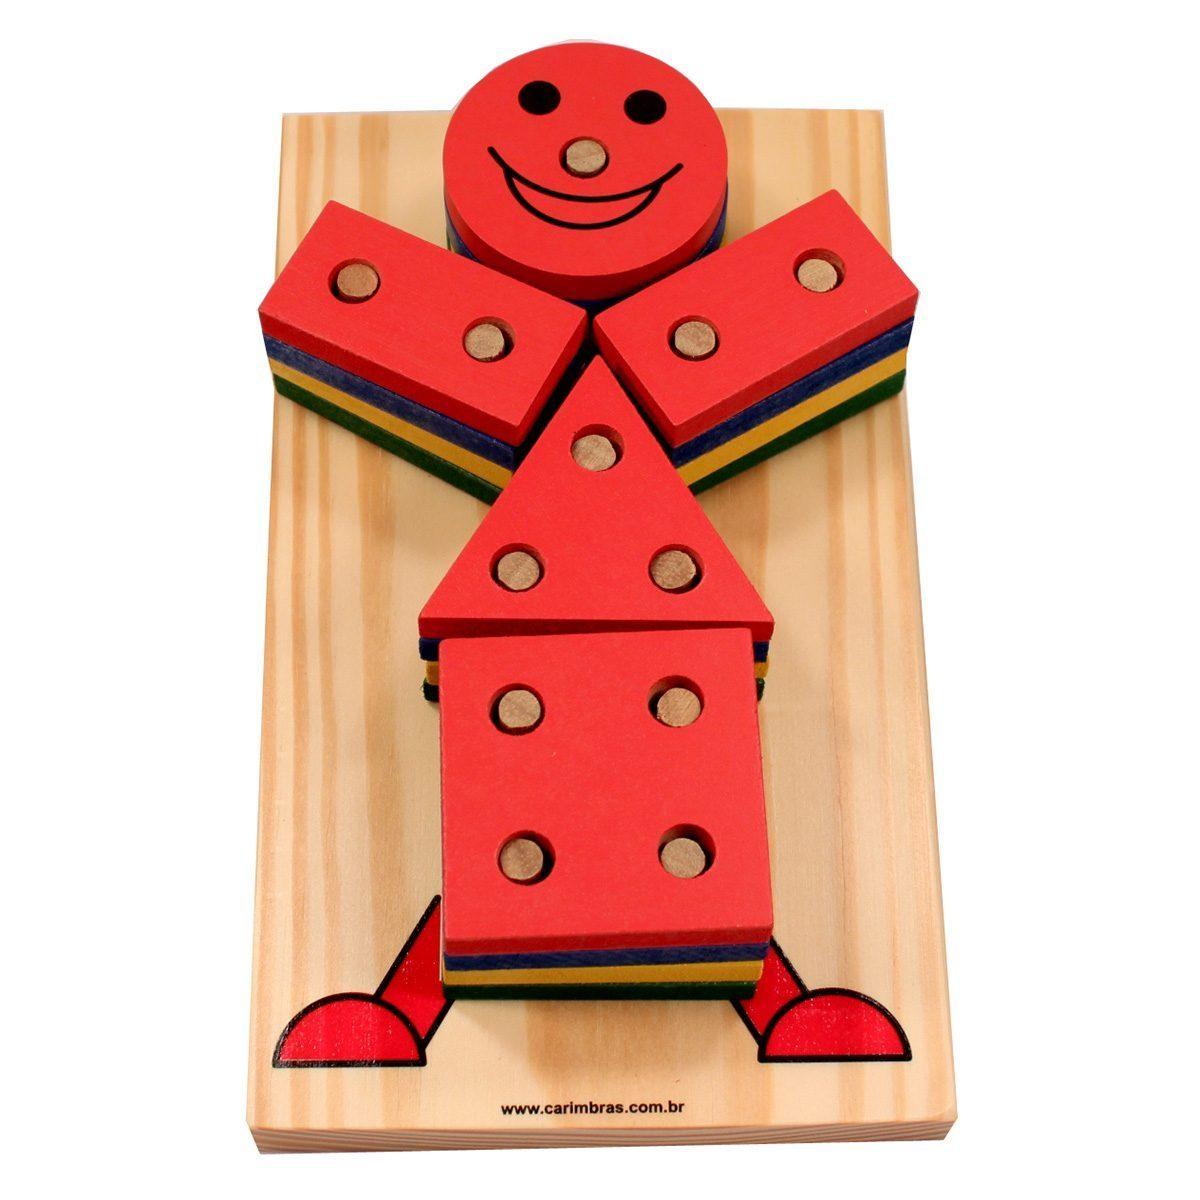 boneco geometrico carimbras 5772421 1067314 9343613